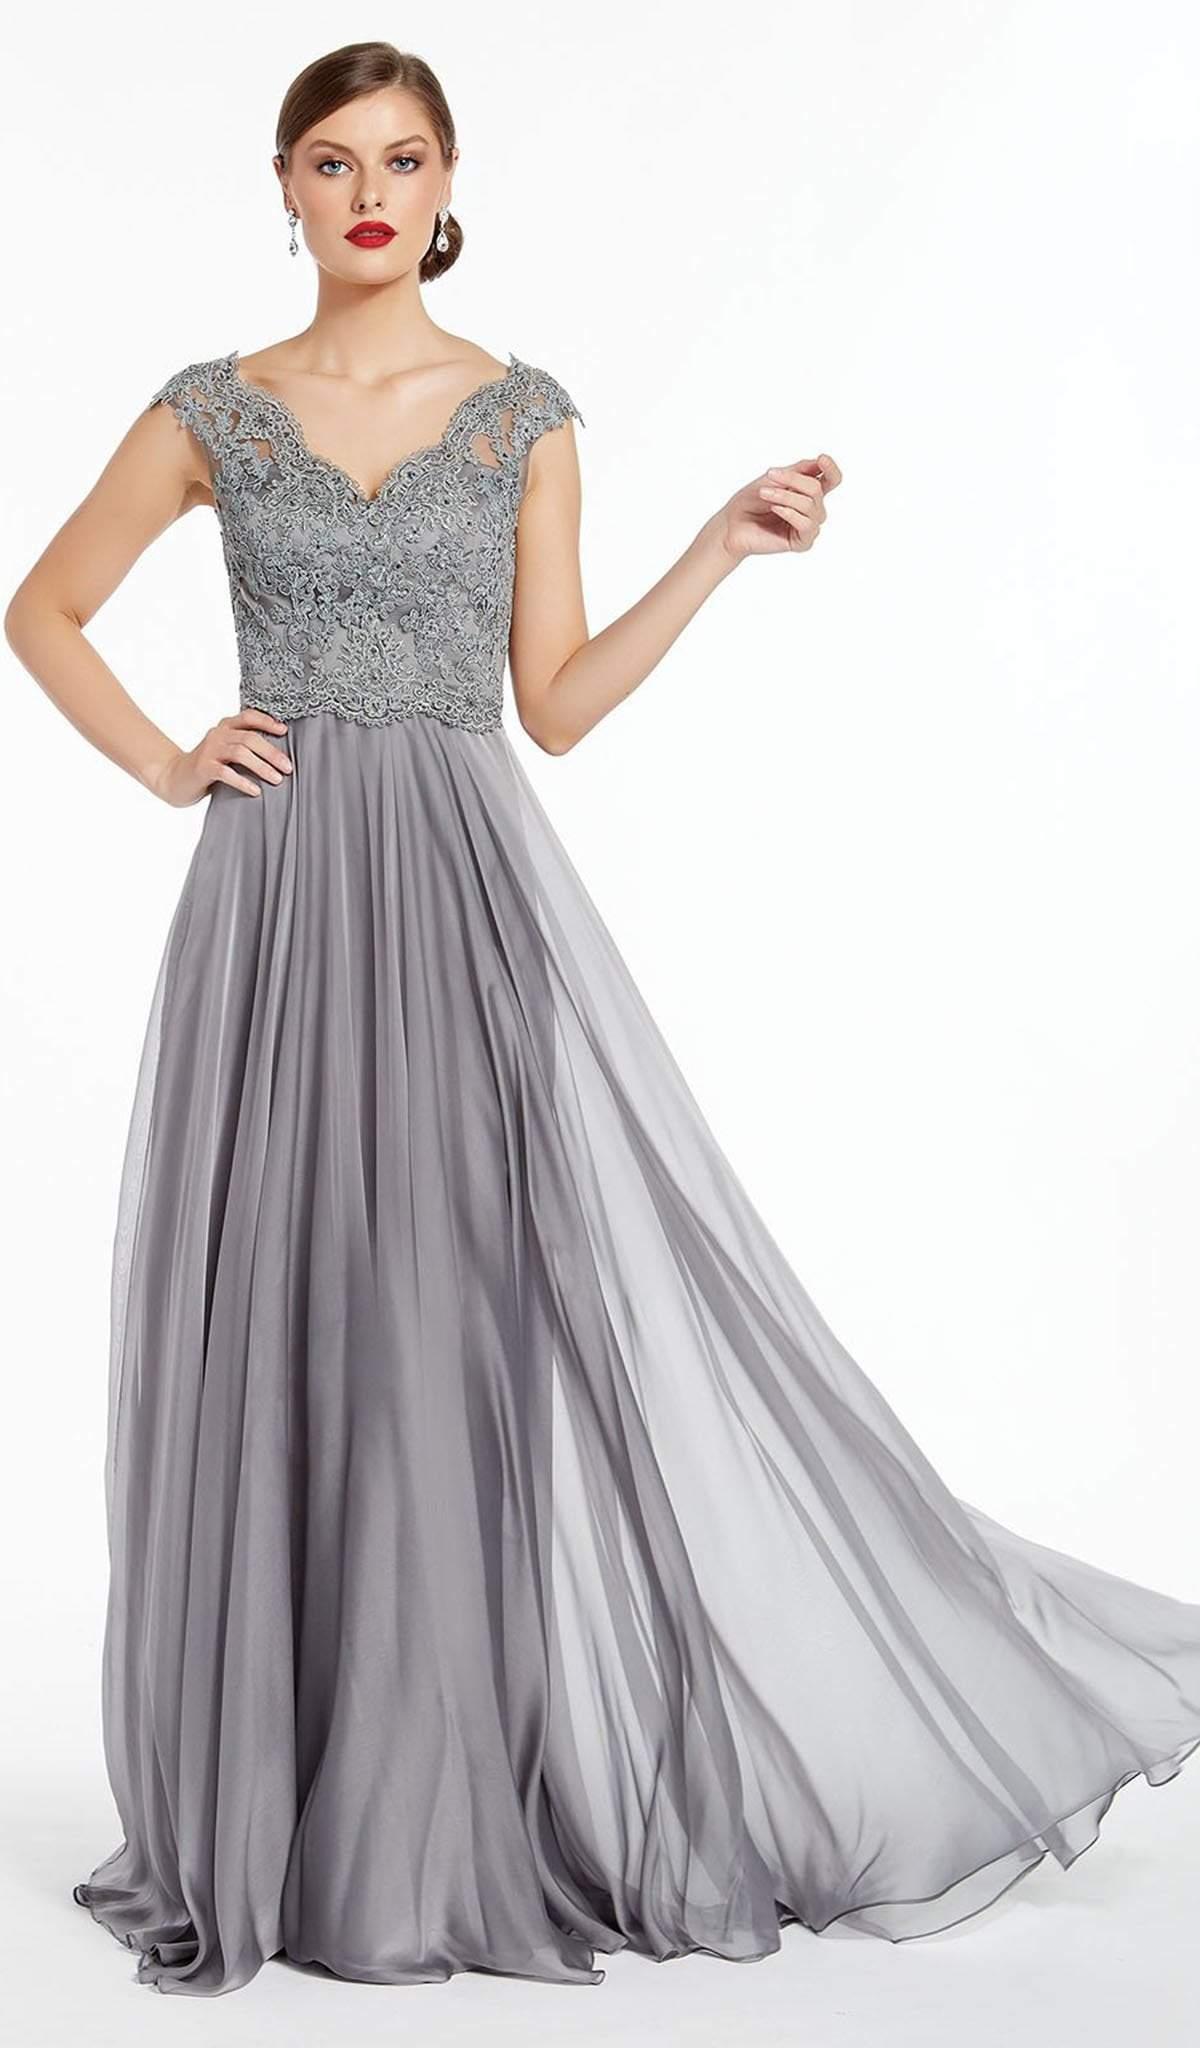 Alyce Paris - 27315 Cap Sleeve Scalloped V-Neck Chiffon Gown